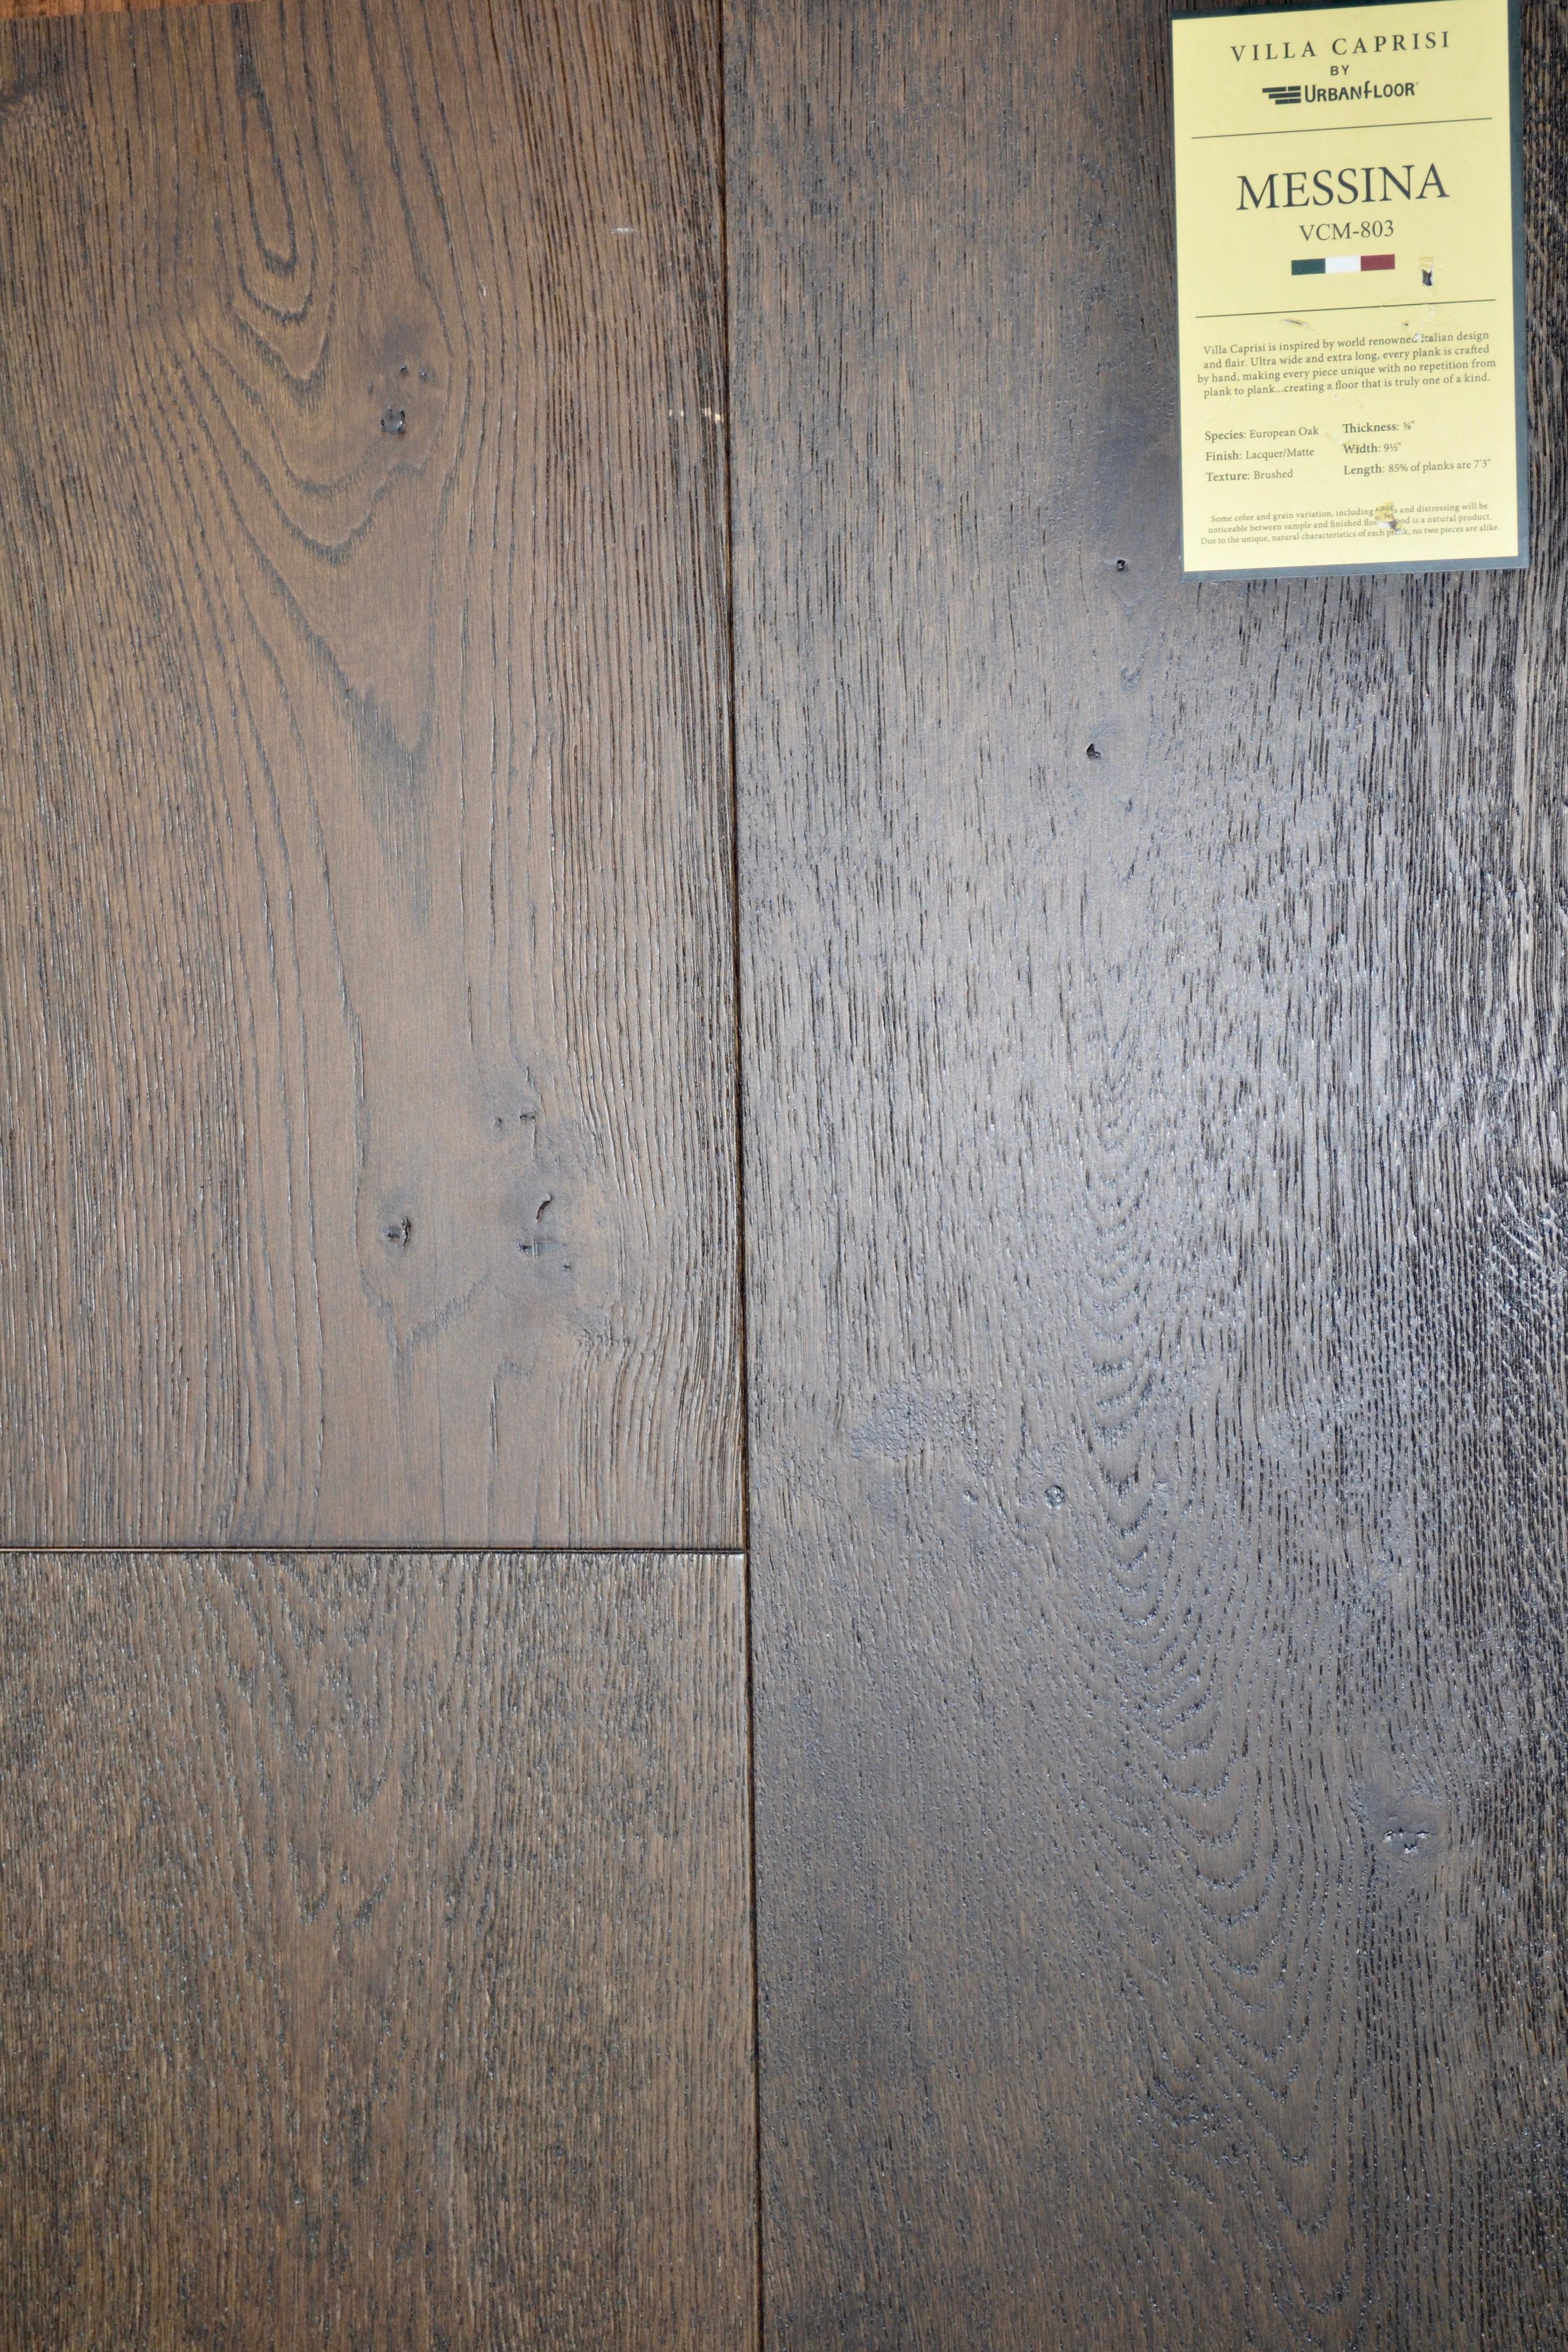 hardwood look laminate flooring of villa caprisi fine european hardwood millennium hardwood inside european style inspired designer oak floor messina by villa caprisi